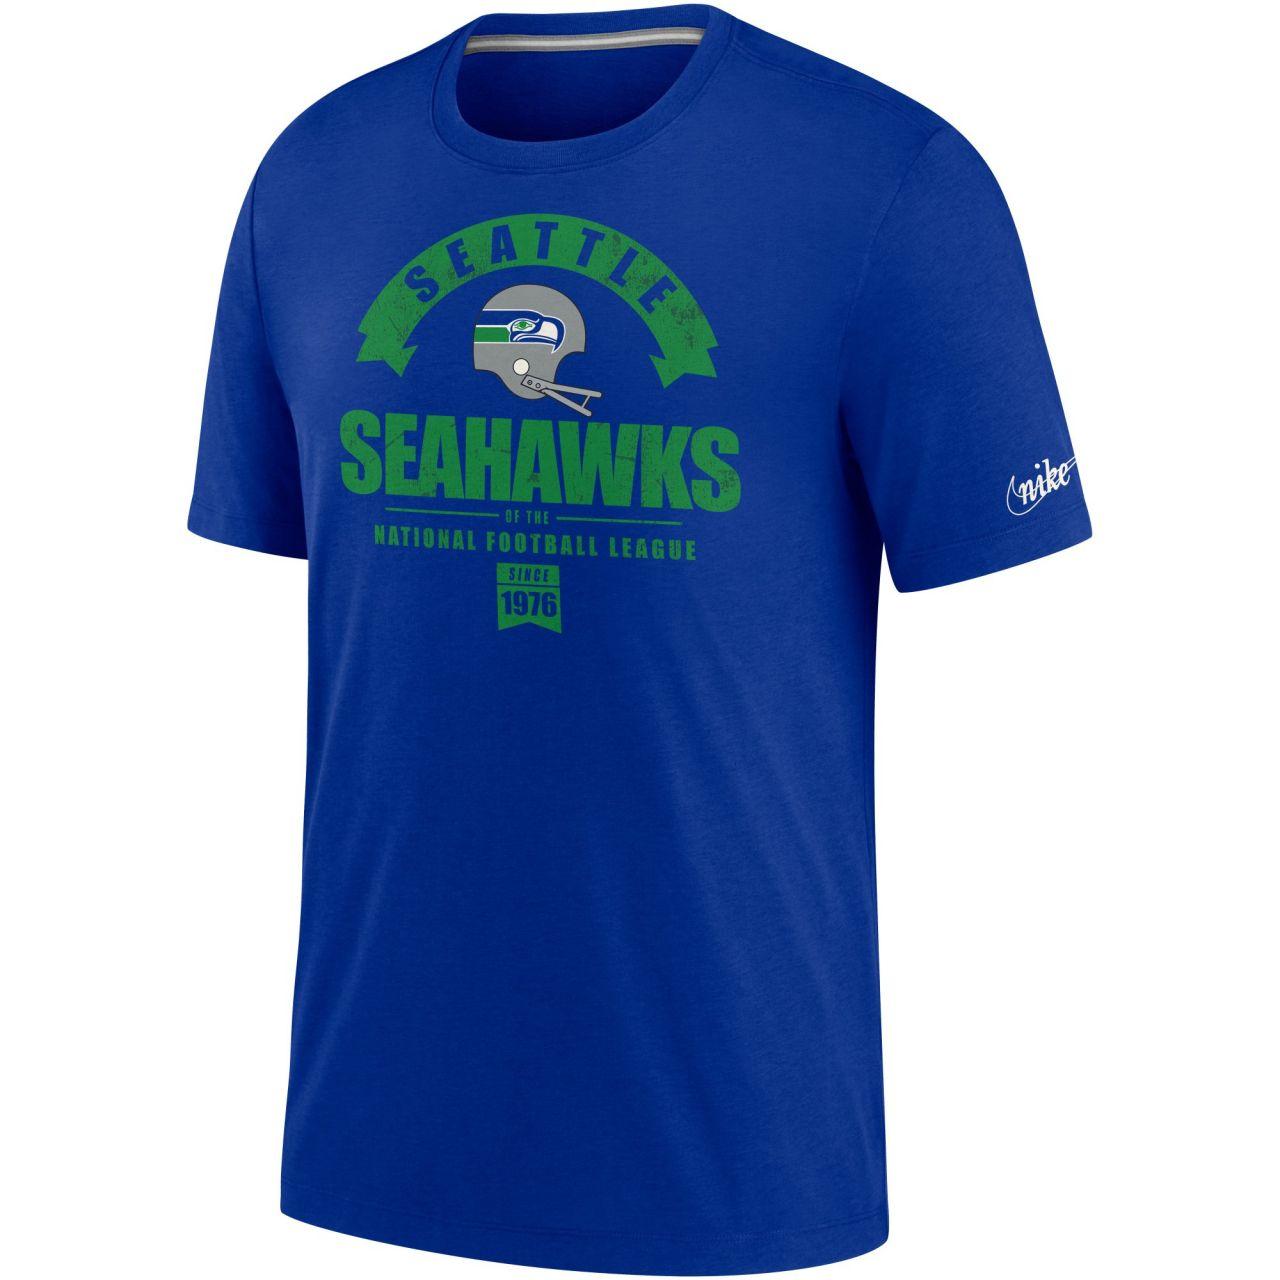 amfoo - Nike Historic Tri-Blend Shirt - Seattle Seahawks 1983-1990